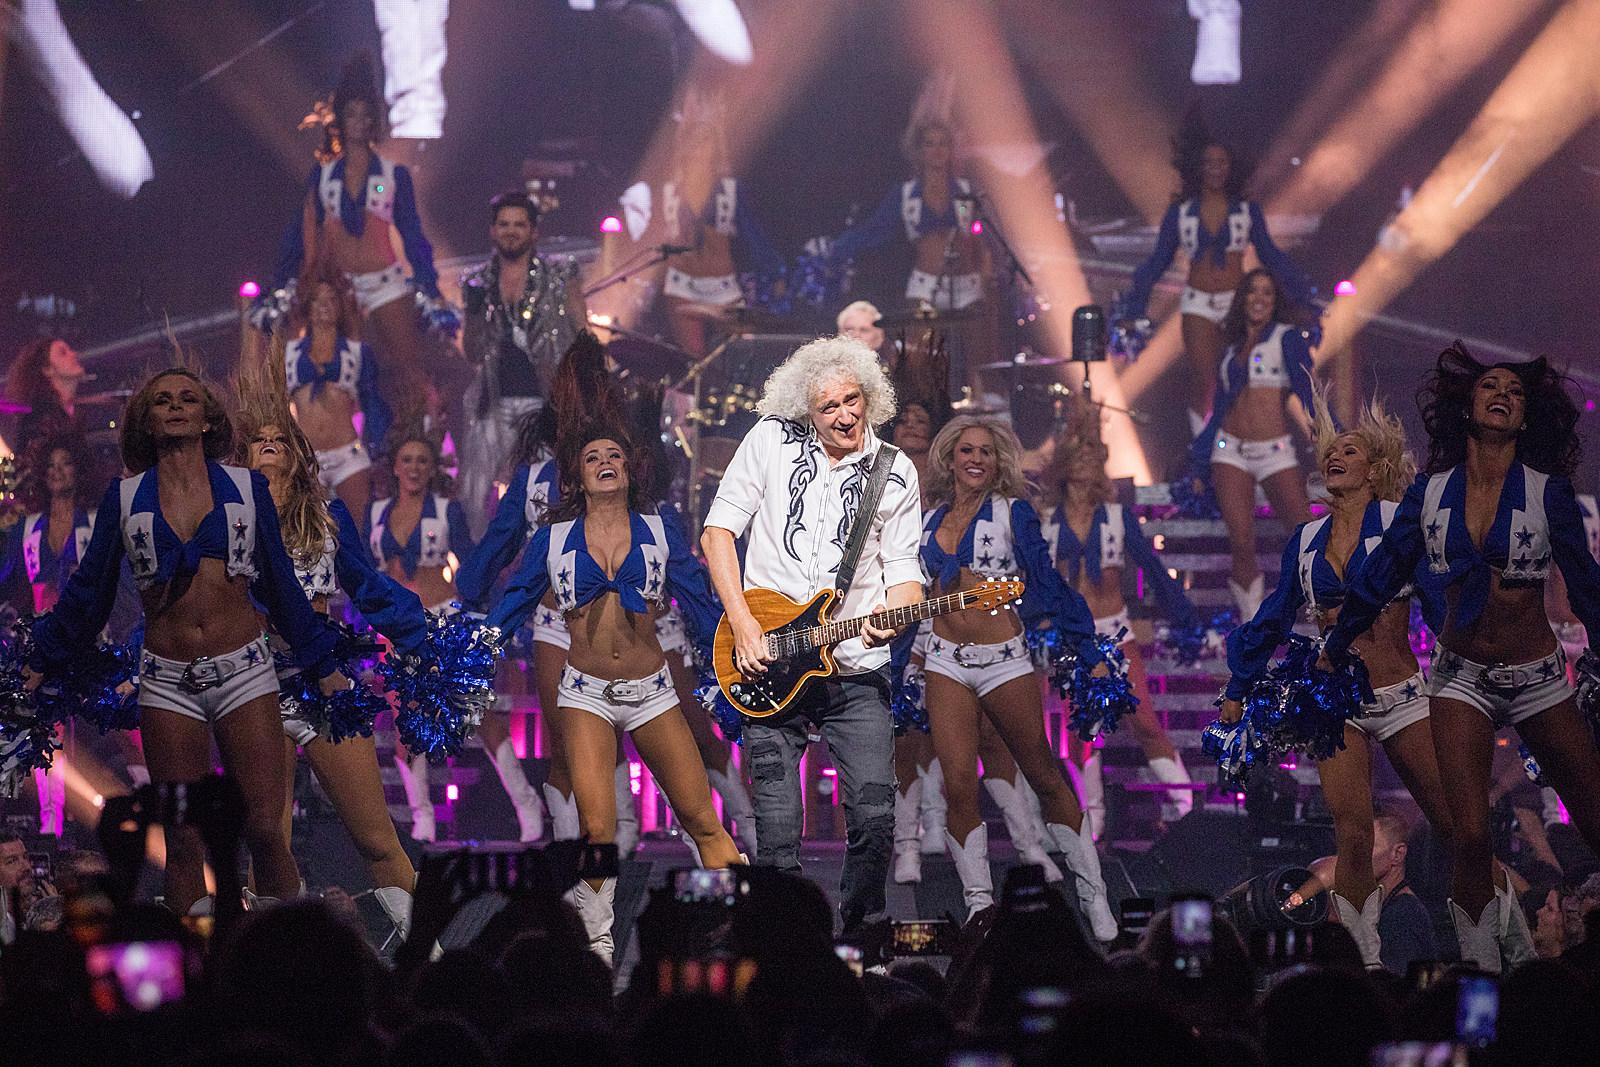 What Happened to the 'Idol' Star Who Beat Queen's Adam Lambert?